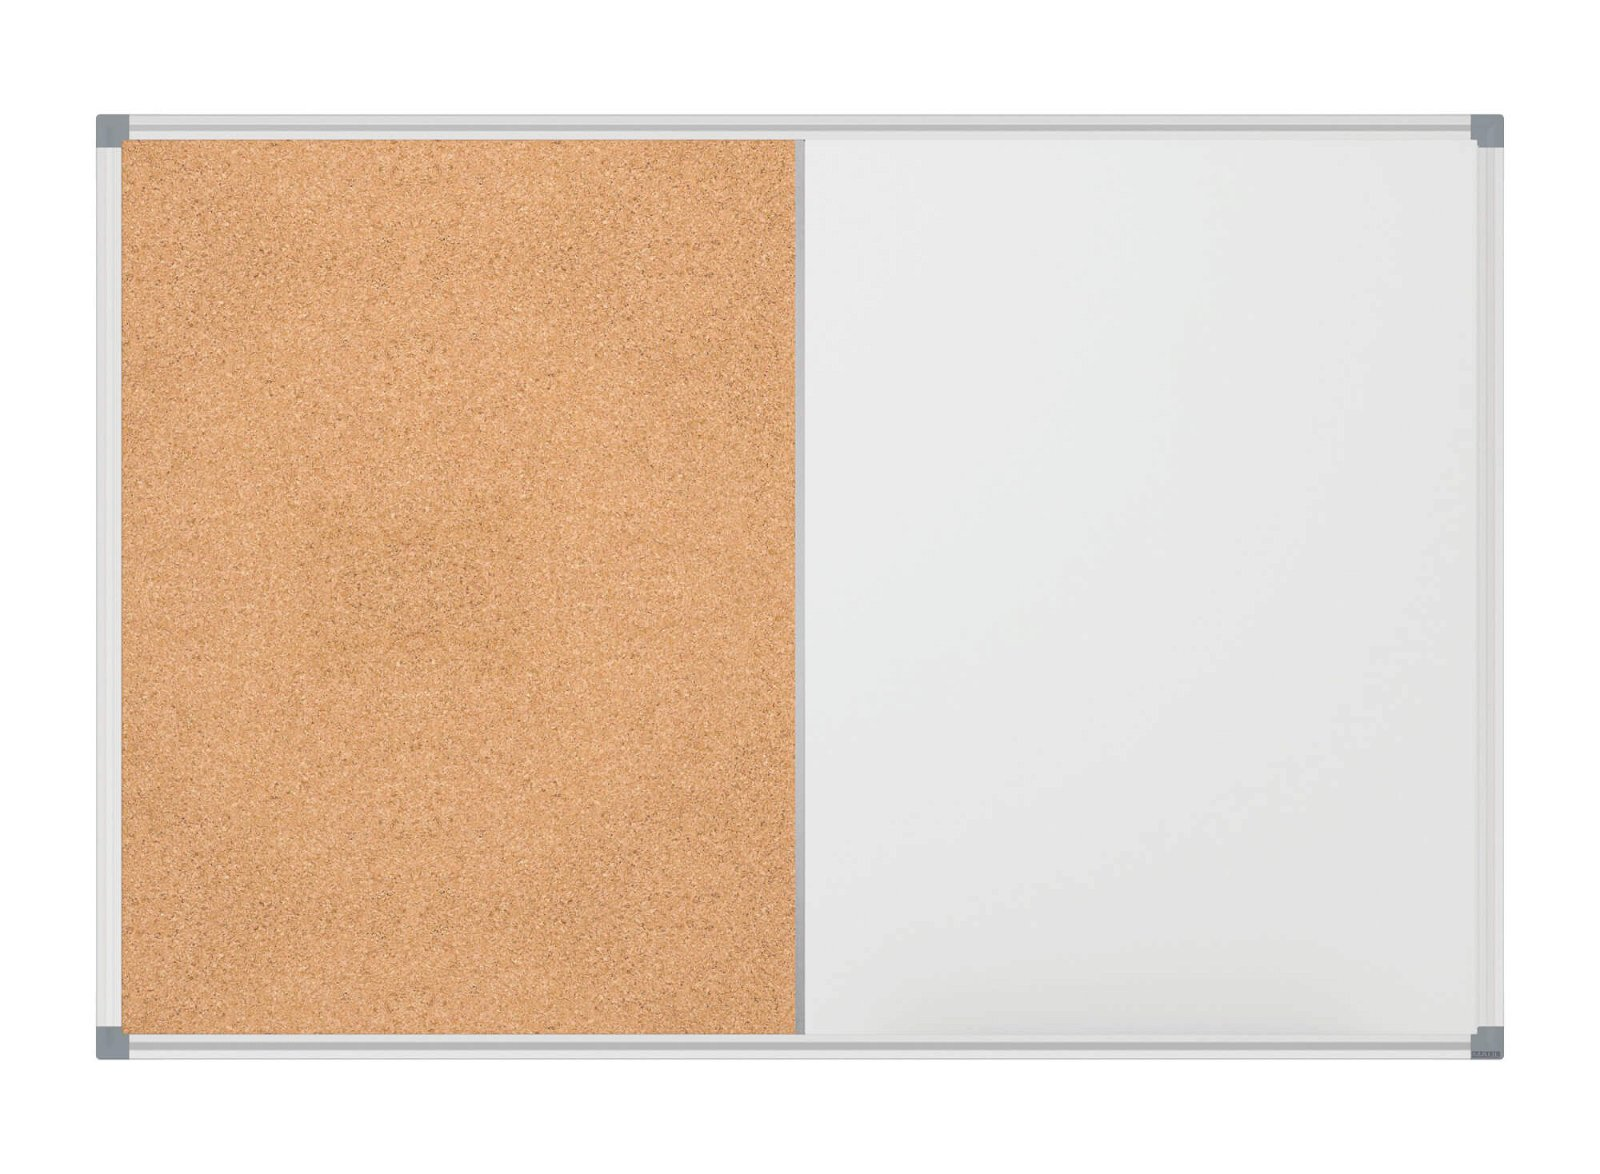 Combiboard MAULstandard, SB-Verpackung